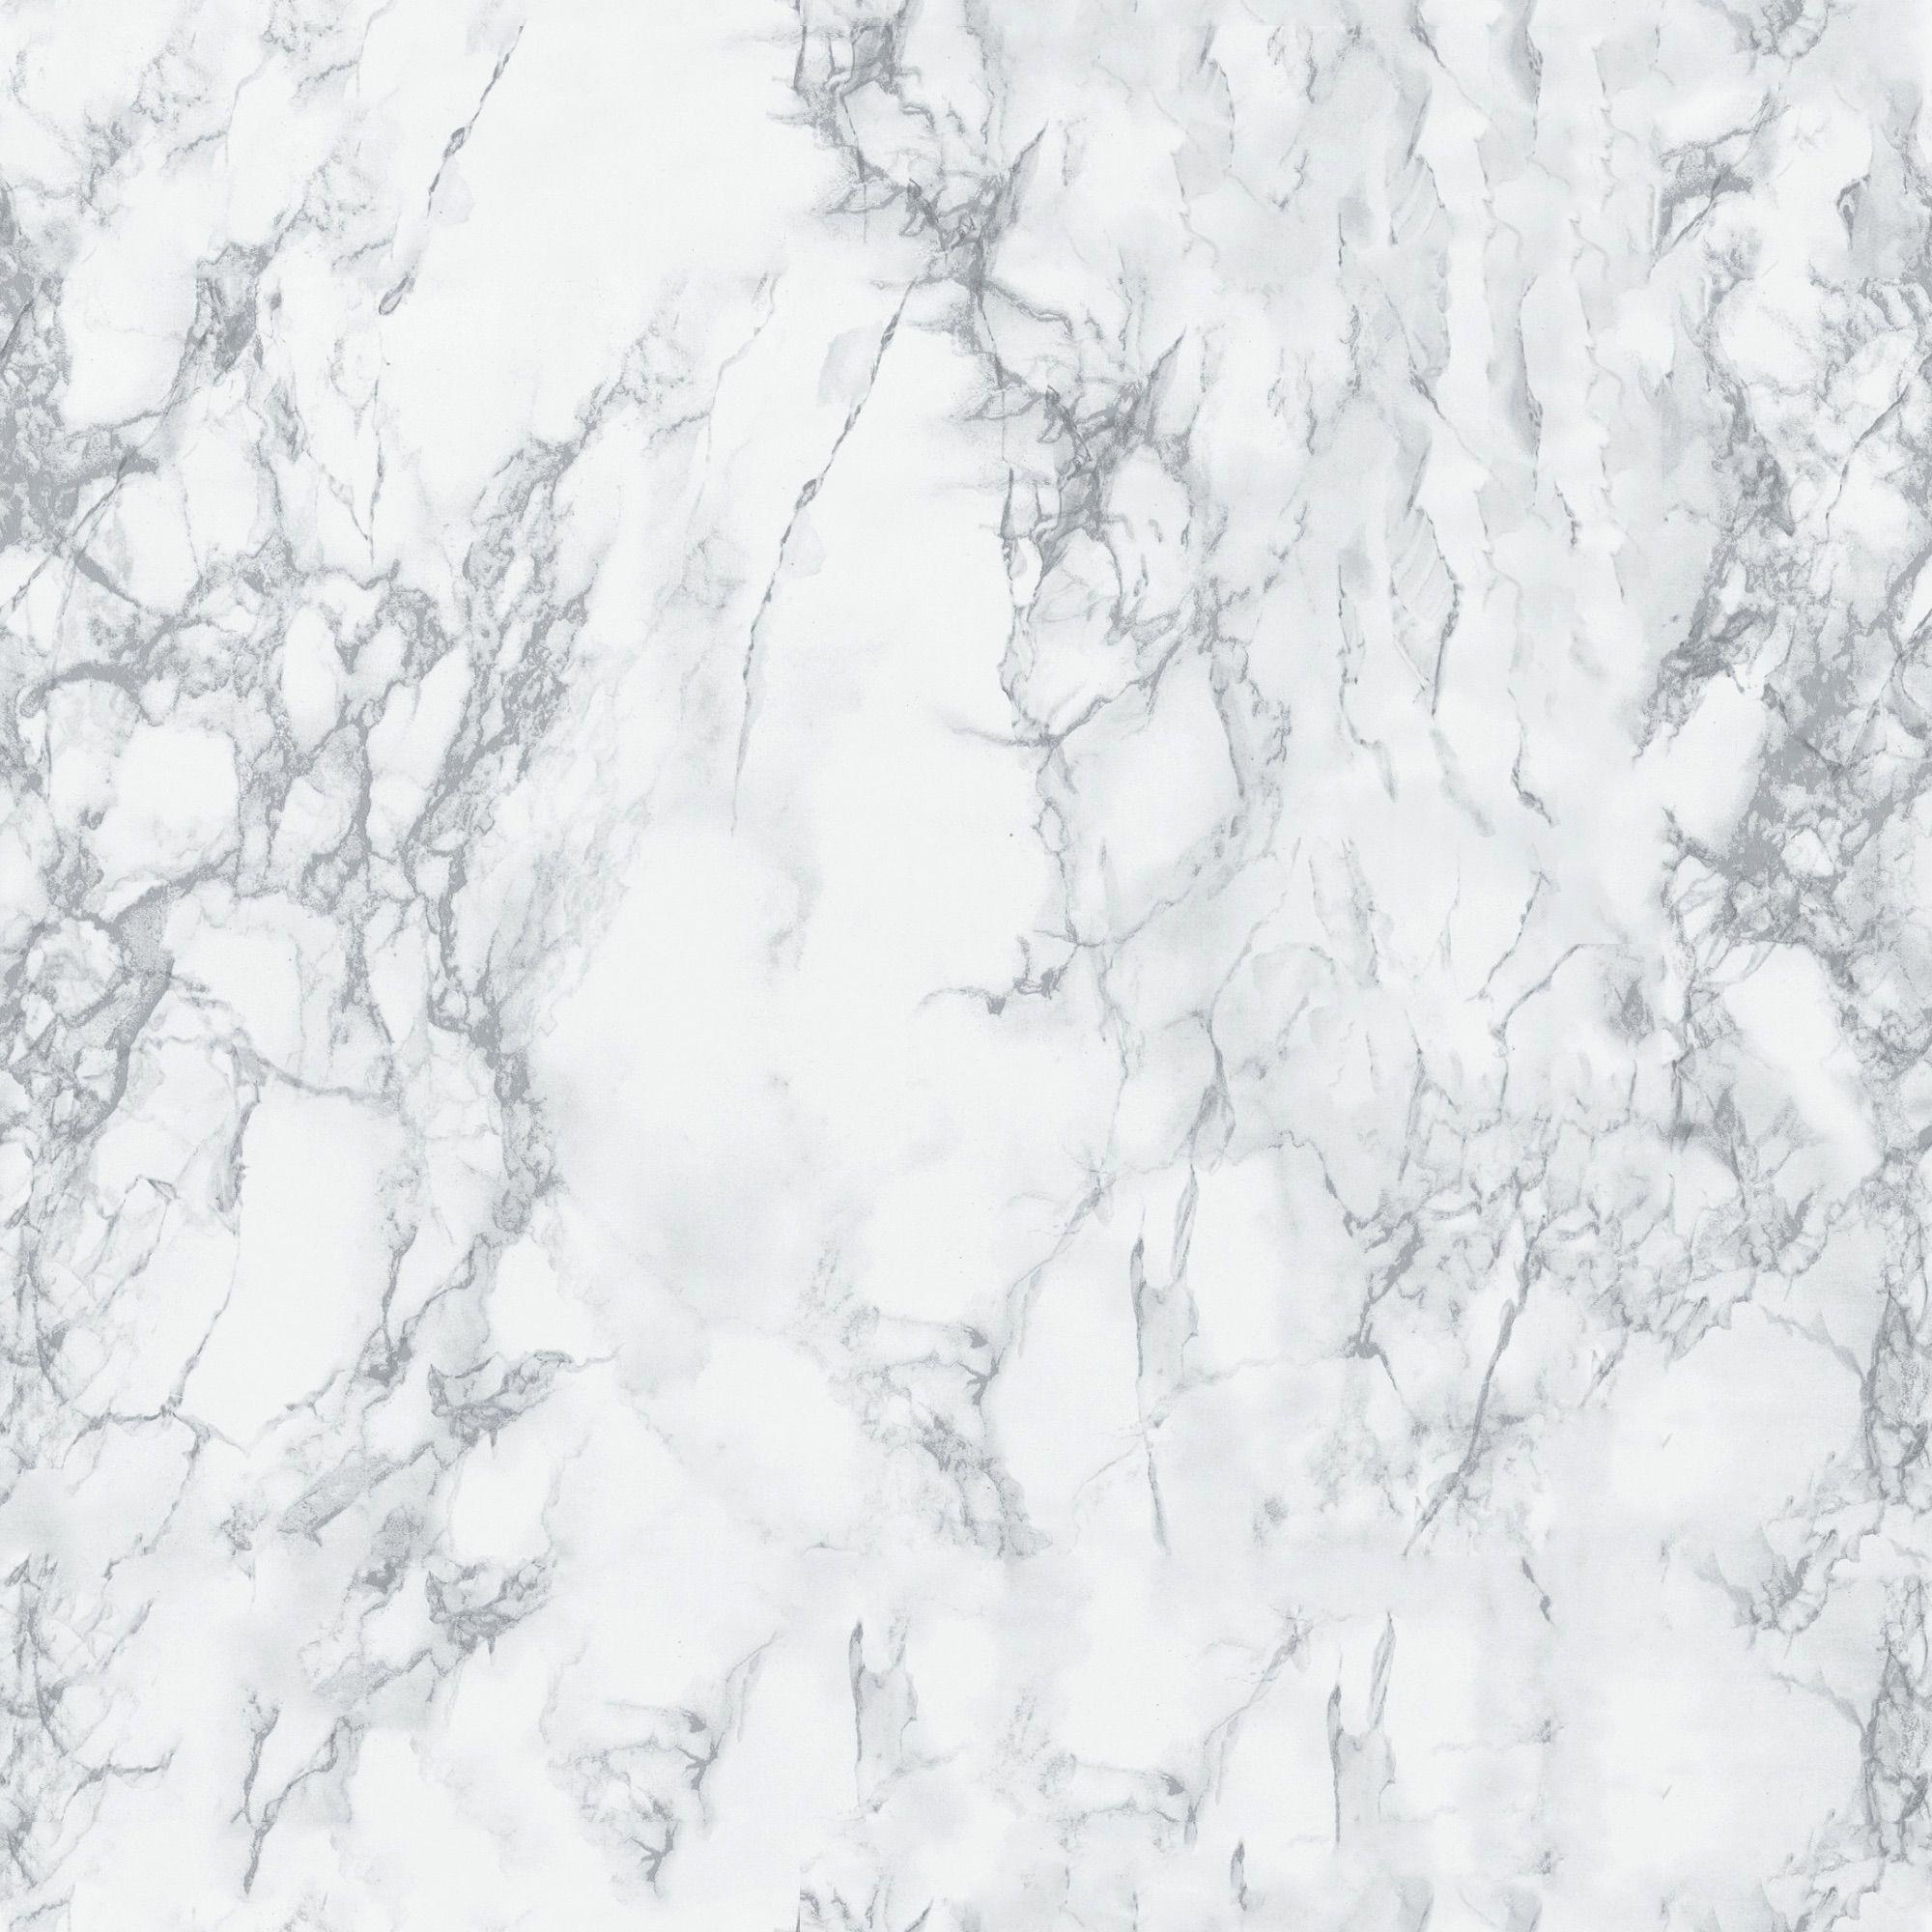 Best Wallpaper Marble Artsy - removable-wallpaper-23-1491405964  Photograph_86777.jpg